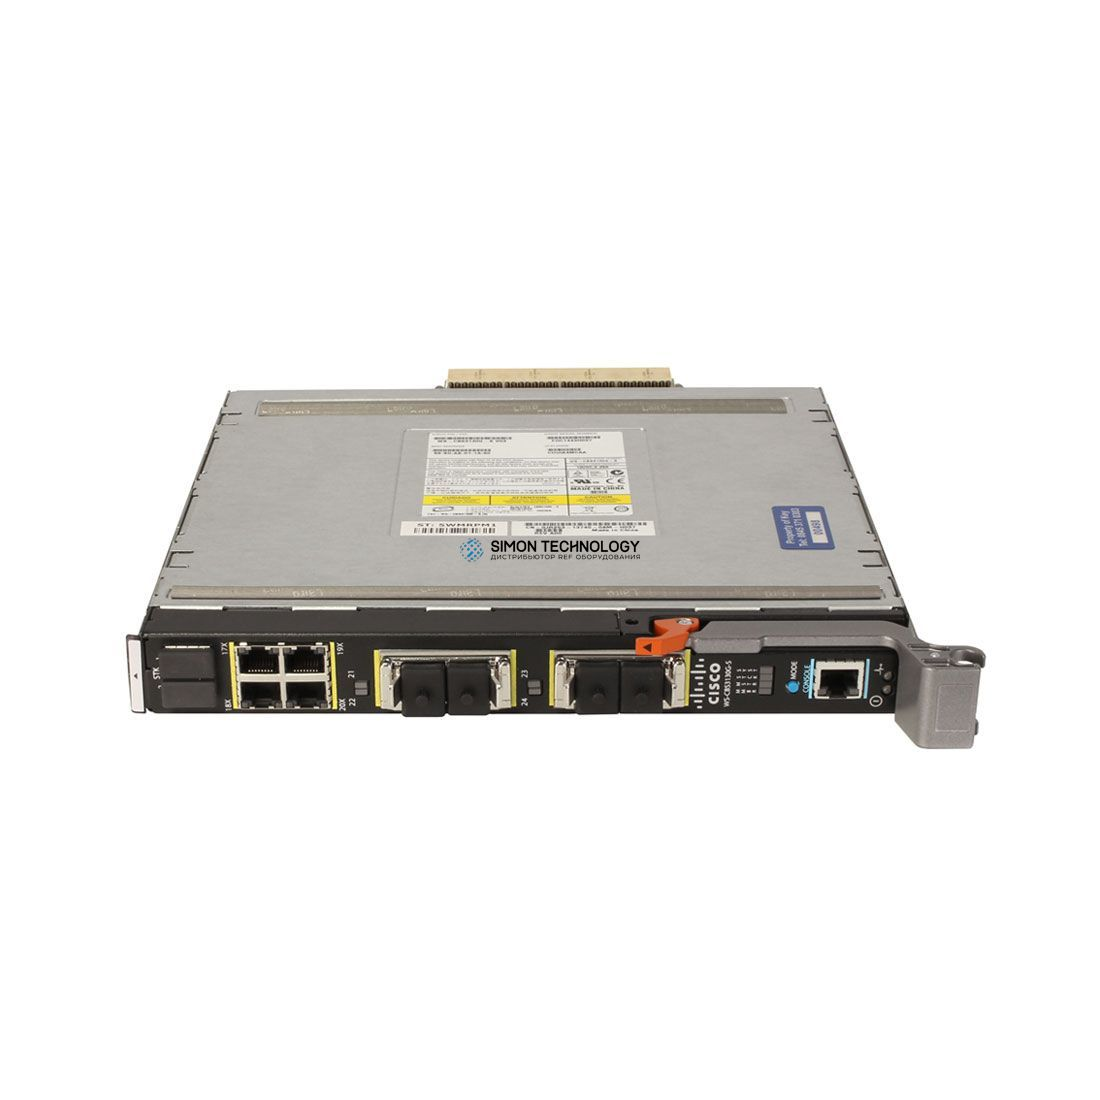 Модуль Dell Dell Switch Cisco Catalyst 3130 1Gbs Stacking PowerEdge M1000e - (JR253)